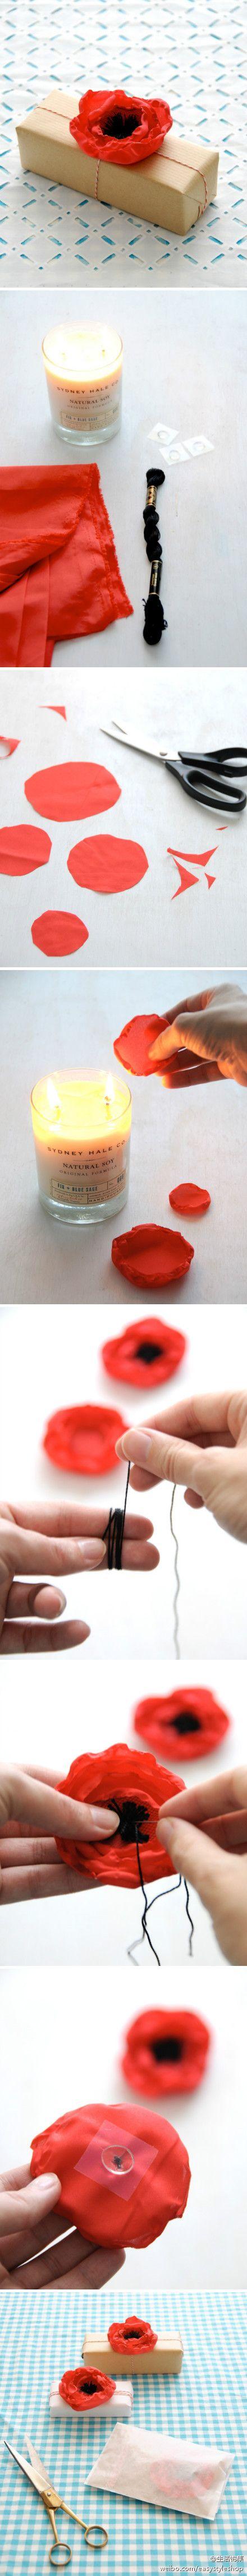 DIY Poppies #Poppies